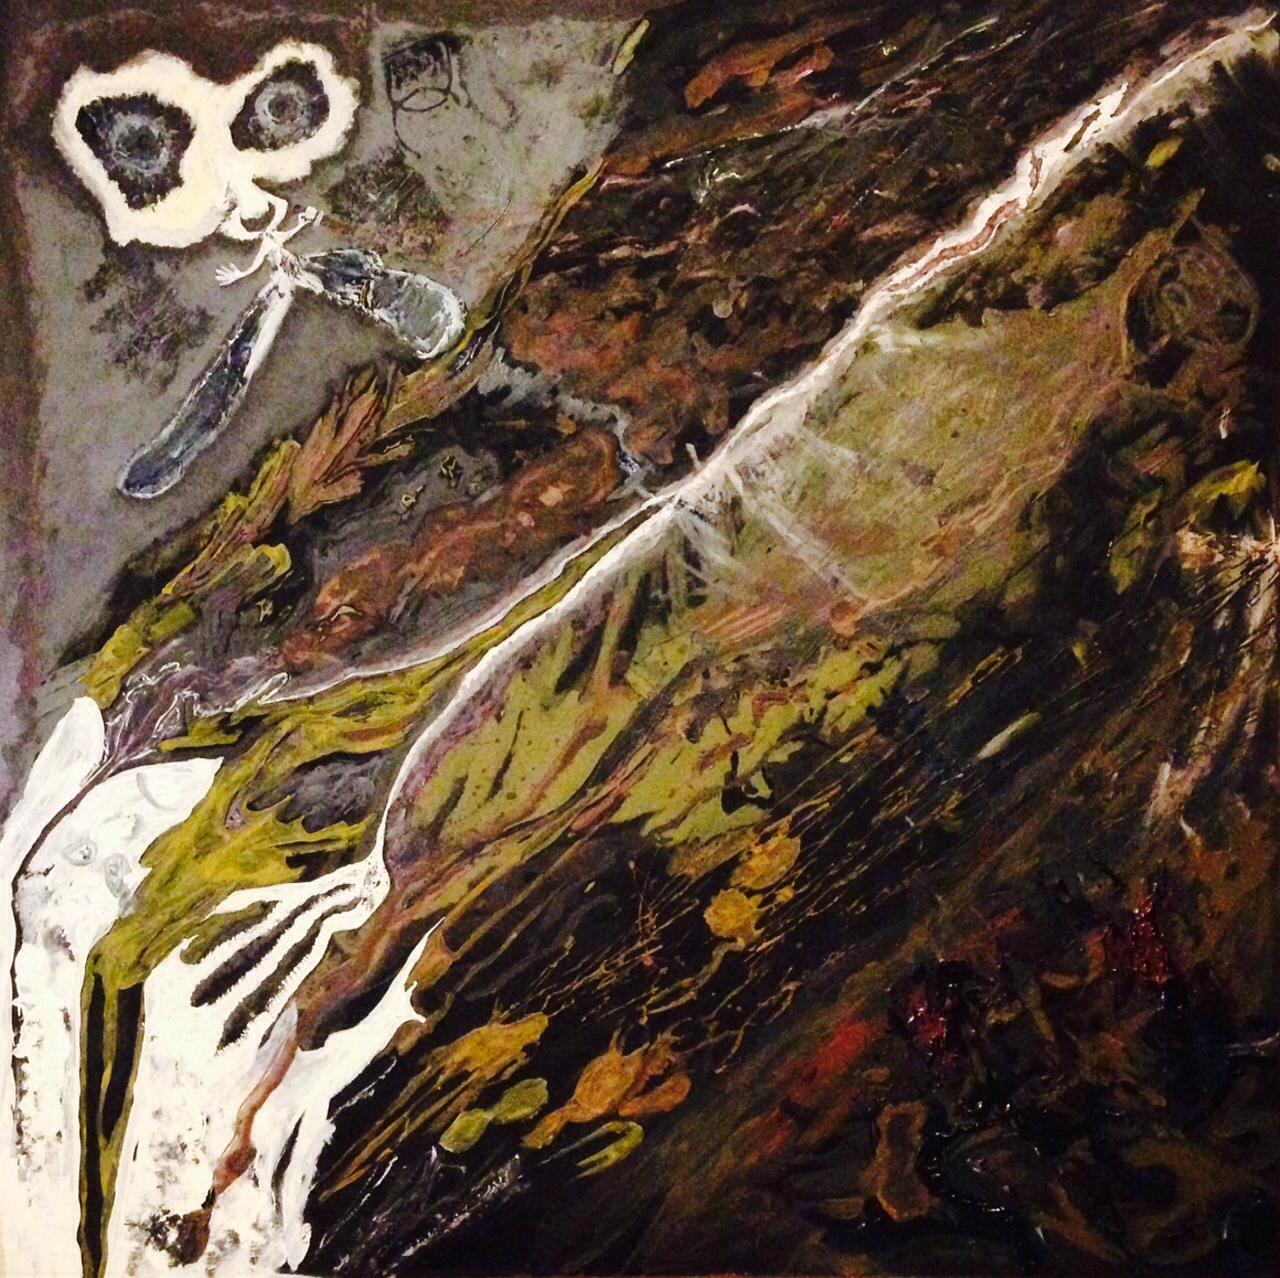 """Twisted Demise"" 24x24 acrylic (2014) Robert Johnson"